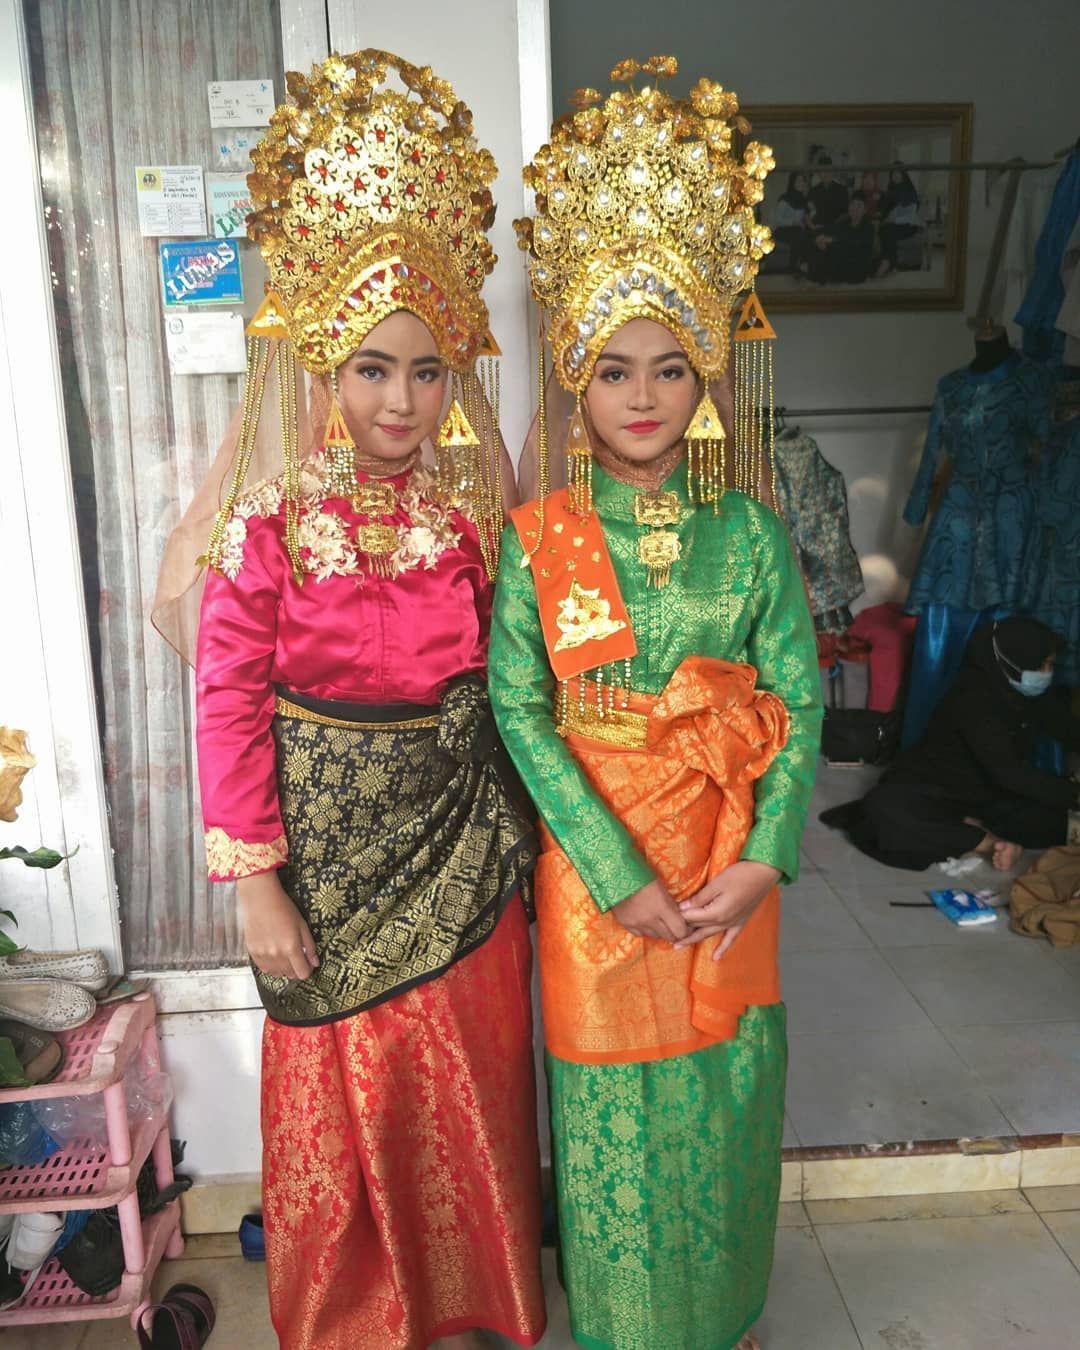 Pakaian Tari Melayu : pakaian, melayu, Busana, Wayang, Padha, Busanaku